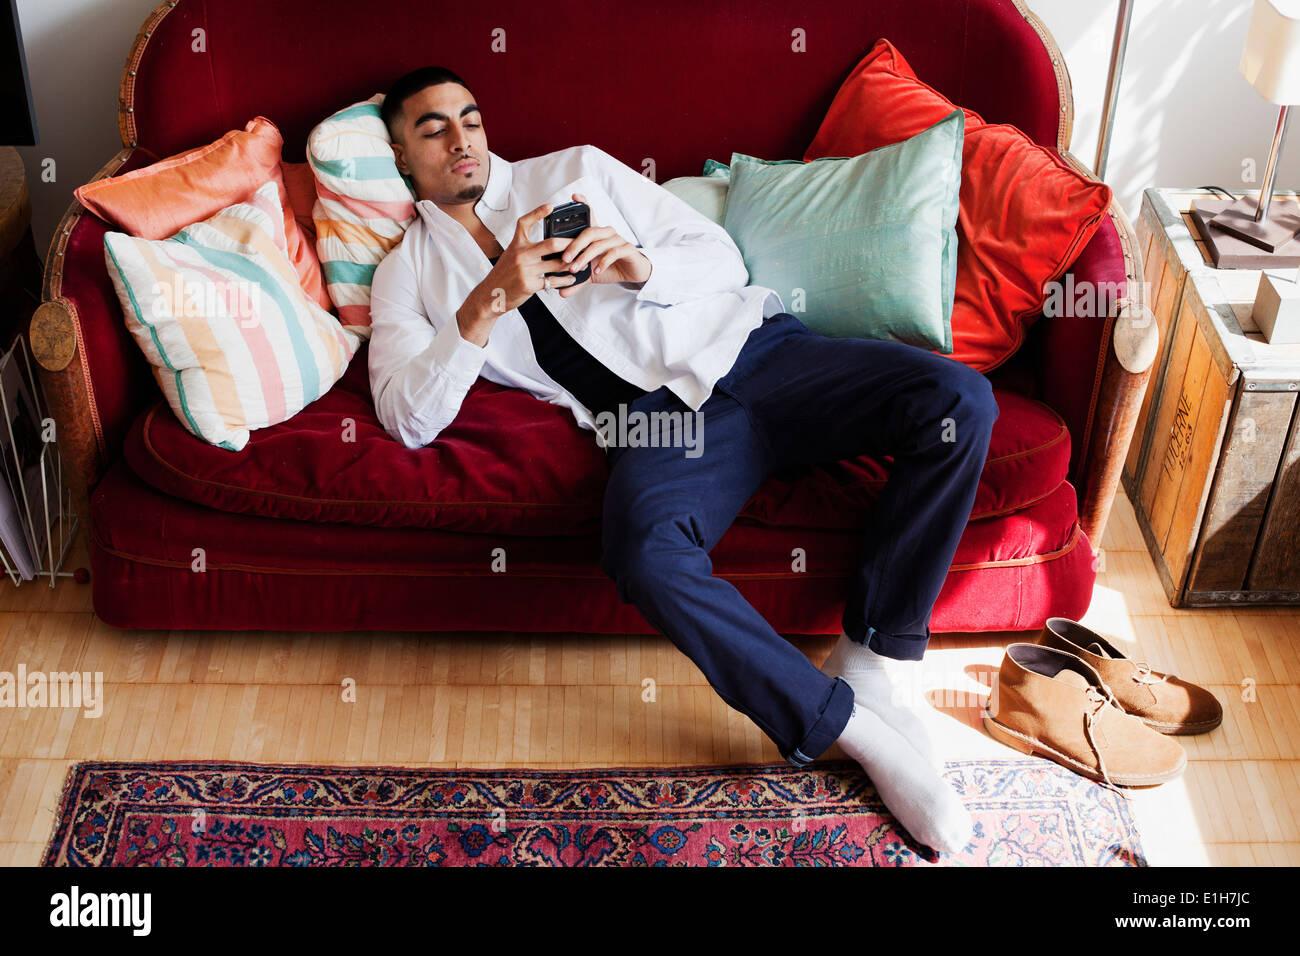 Young man lying on sofa, using smartphone - Stock Image